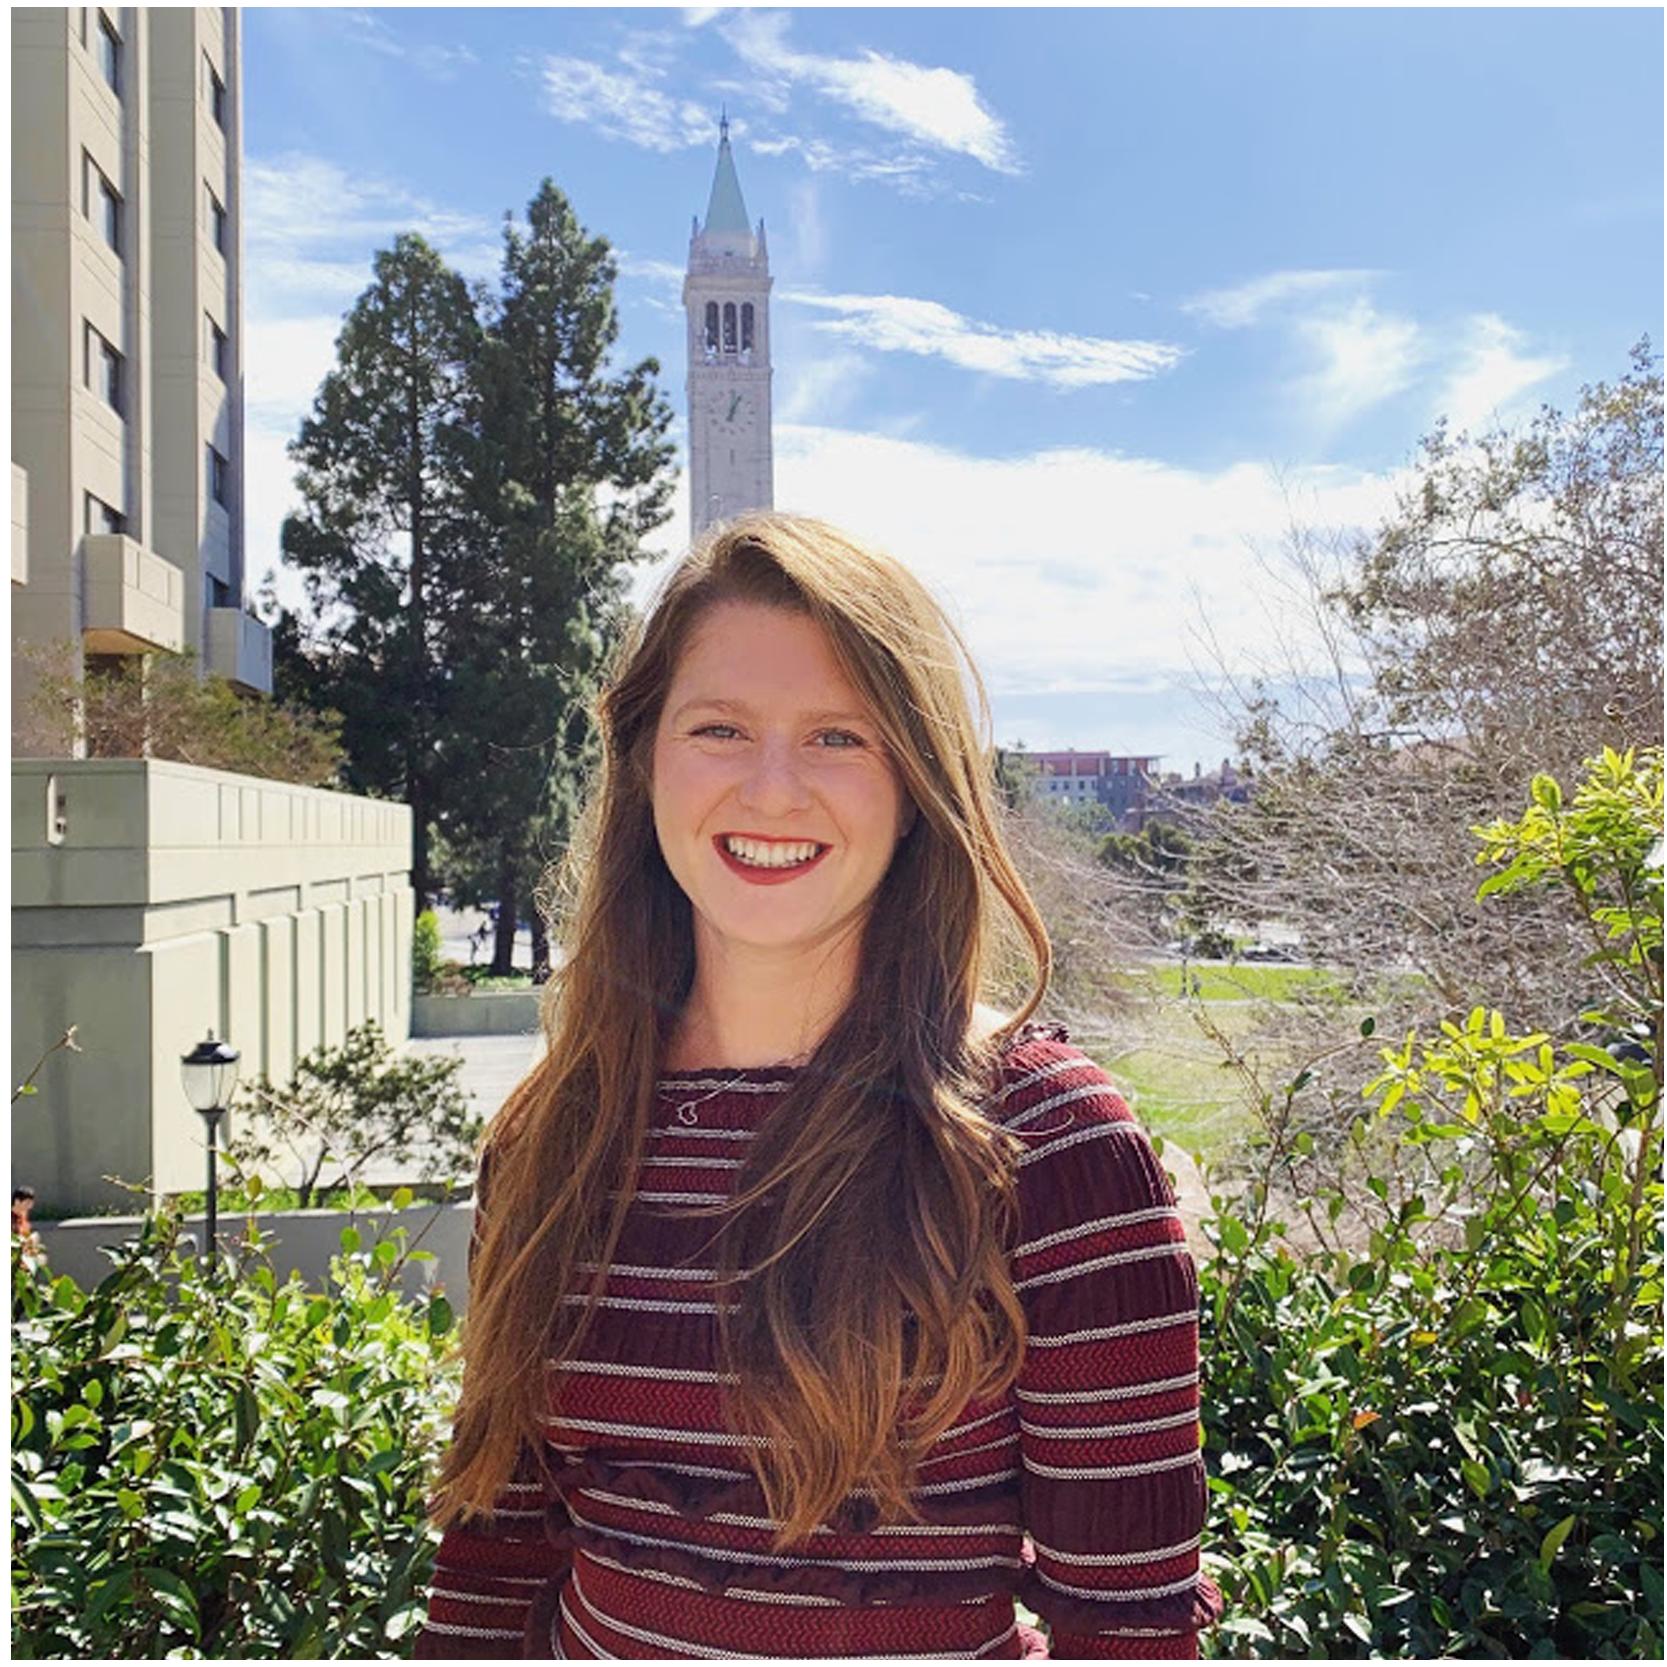 Sierra Alef-Defoe profile picture in Berkeley CA